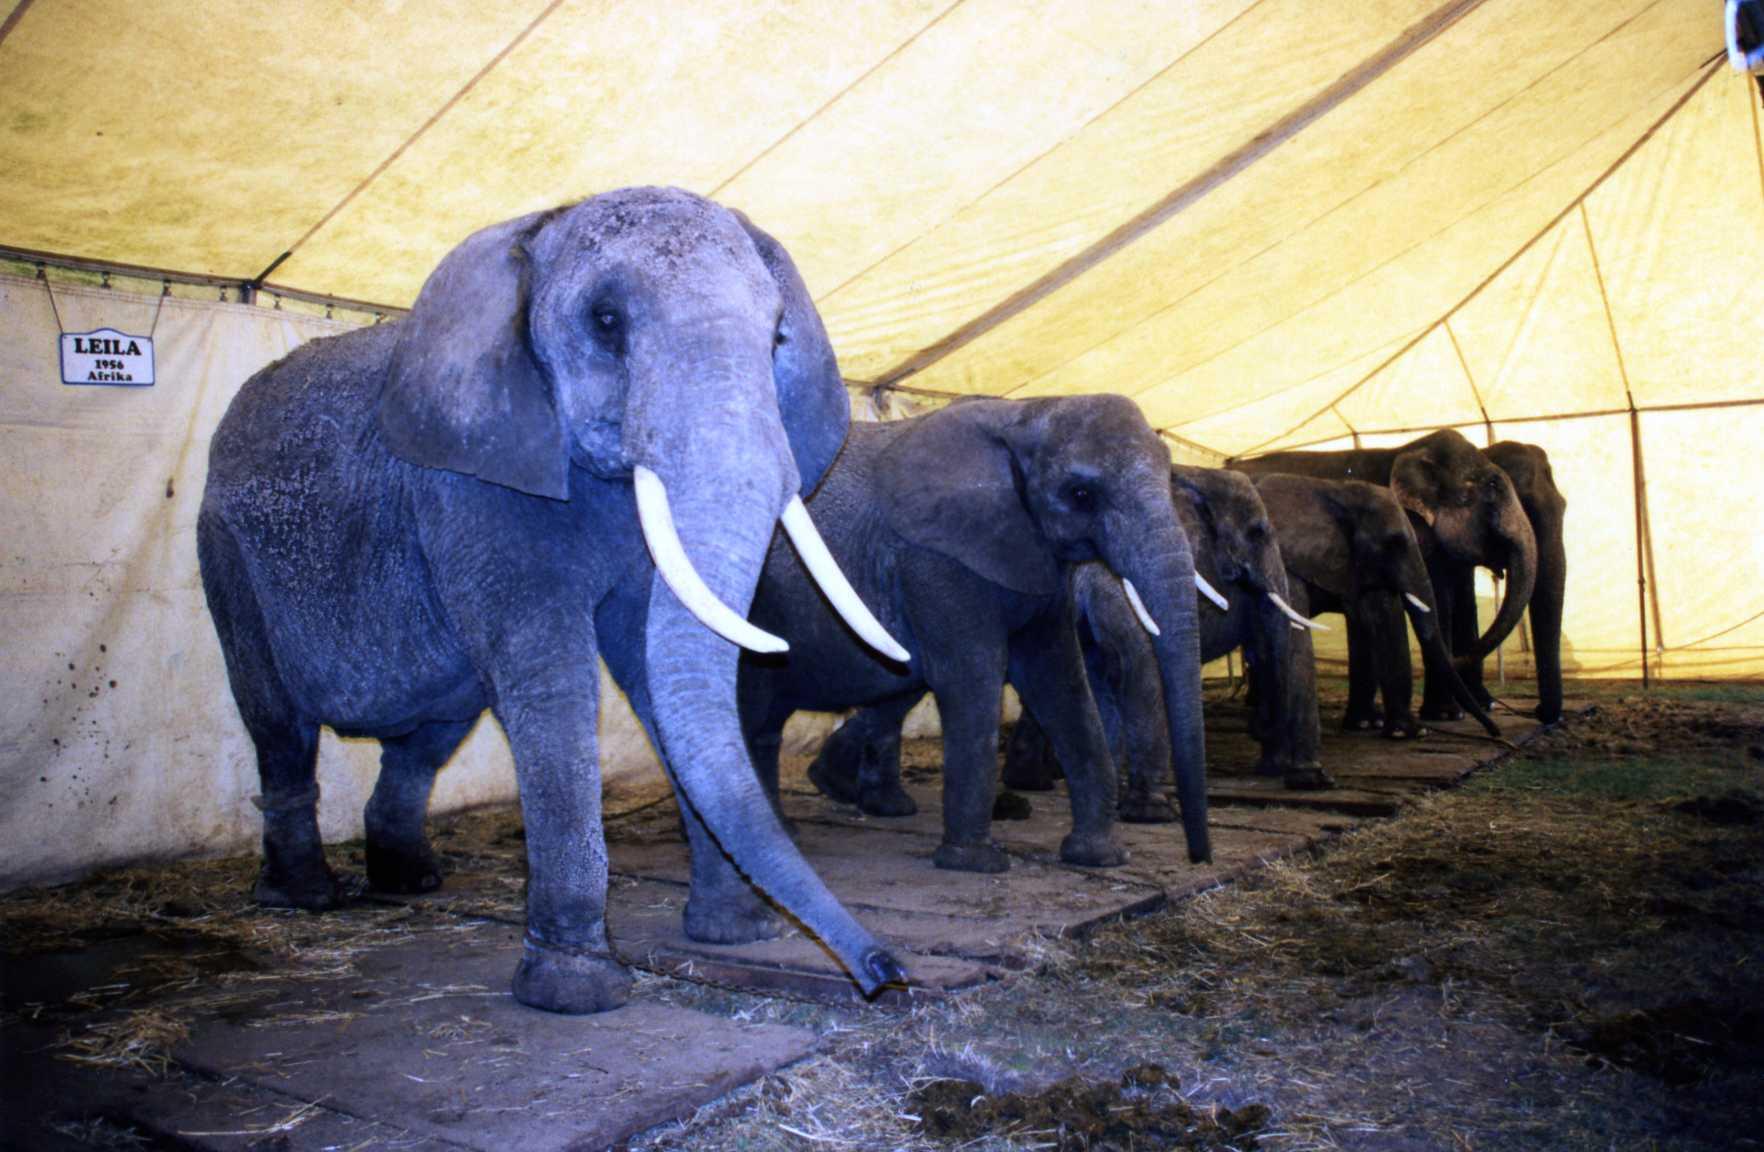 Chained elephants